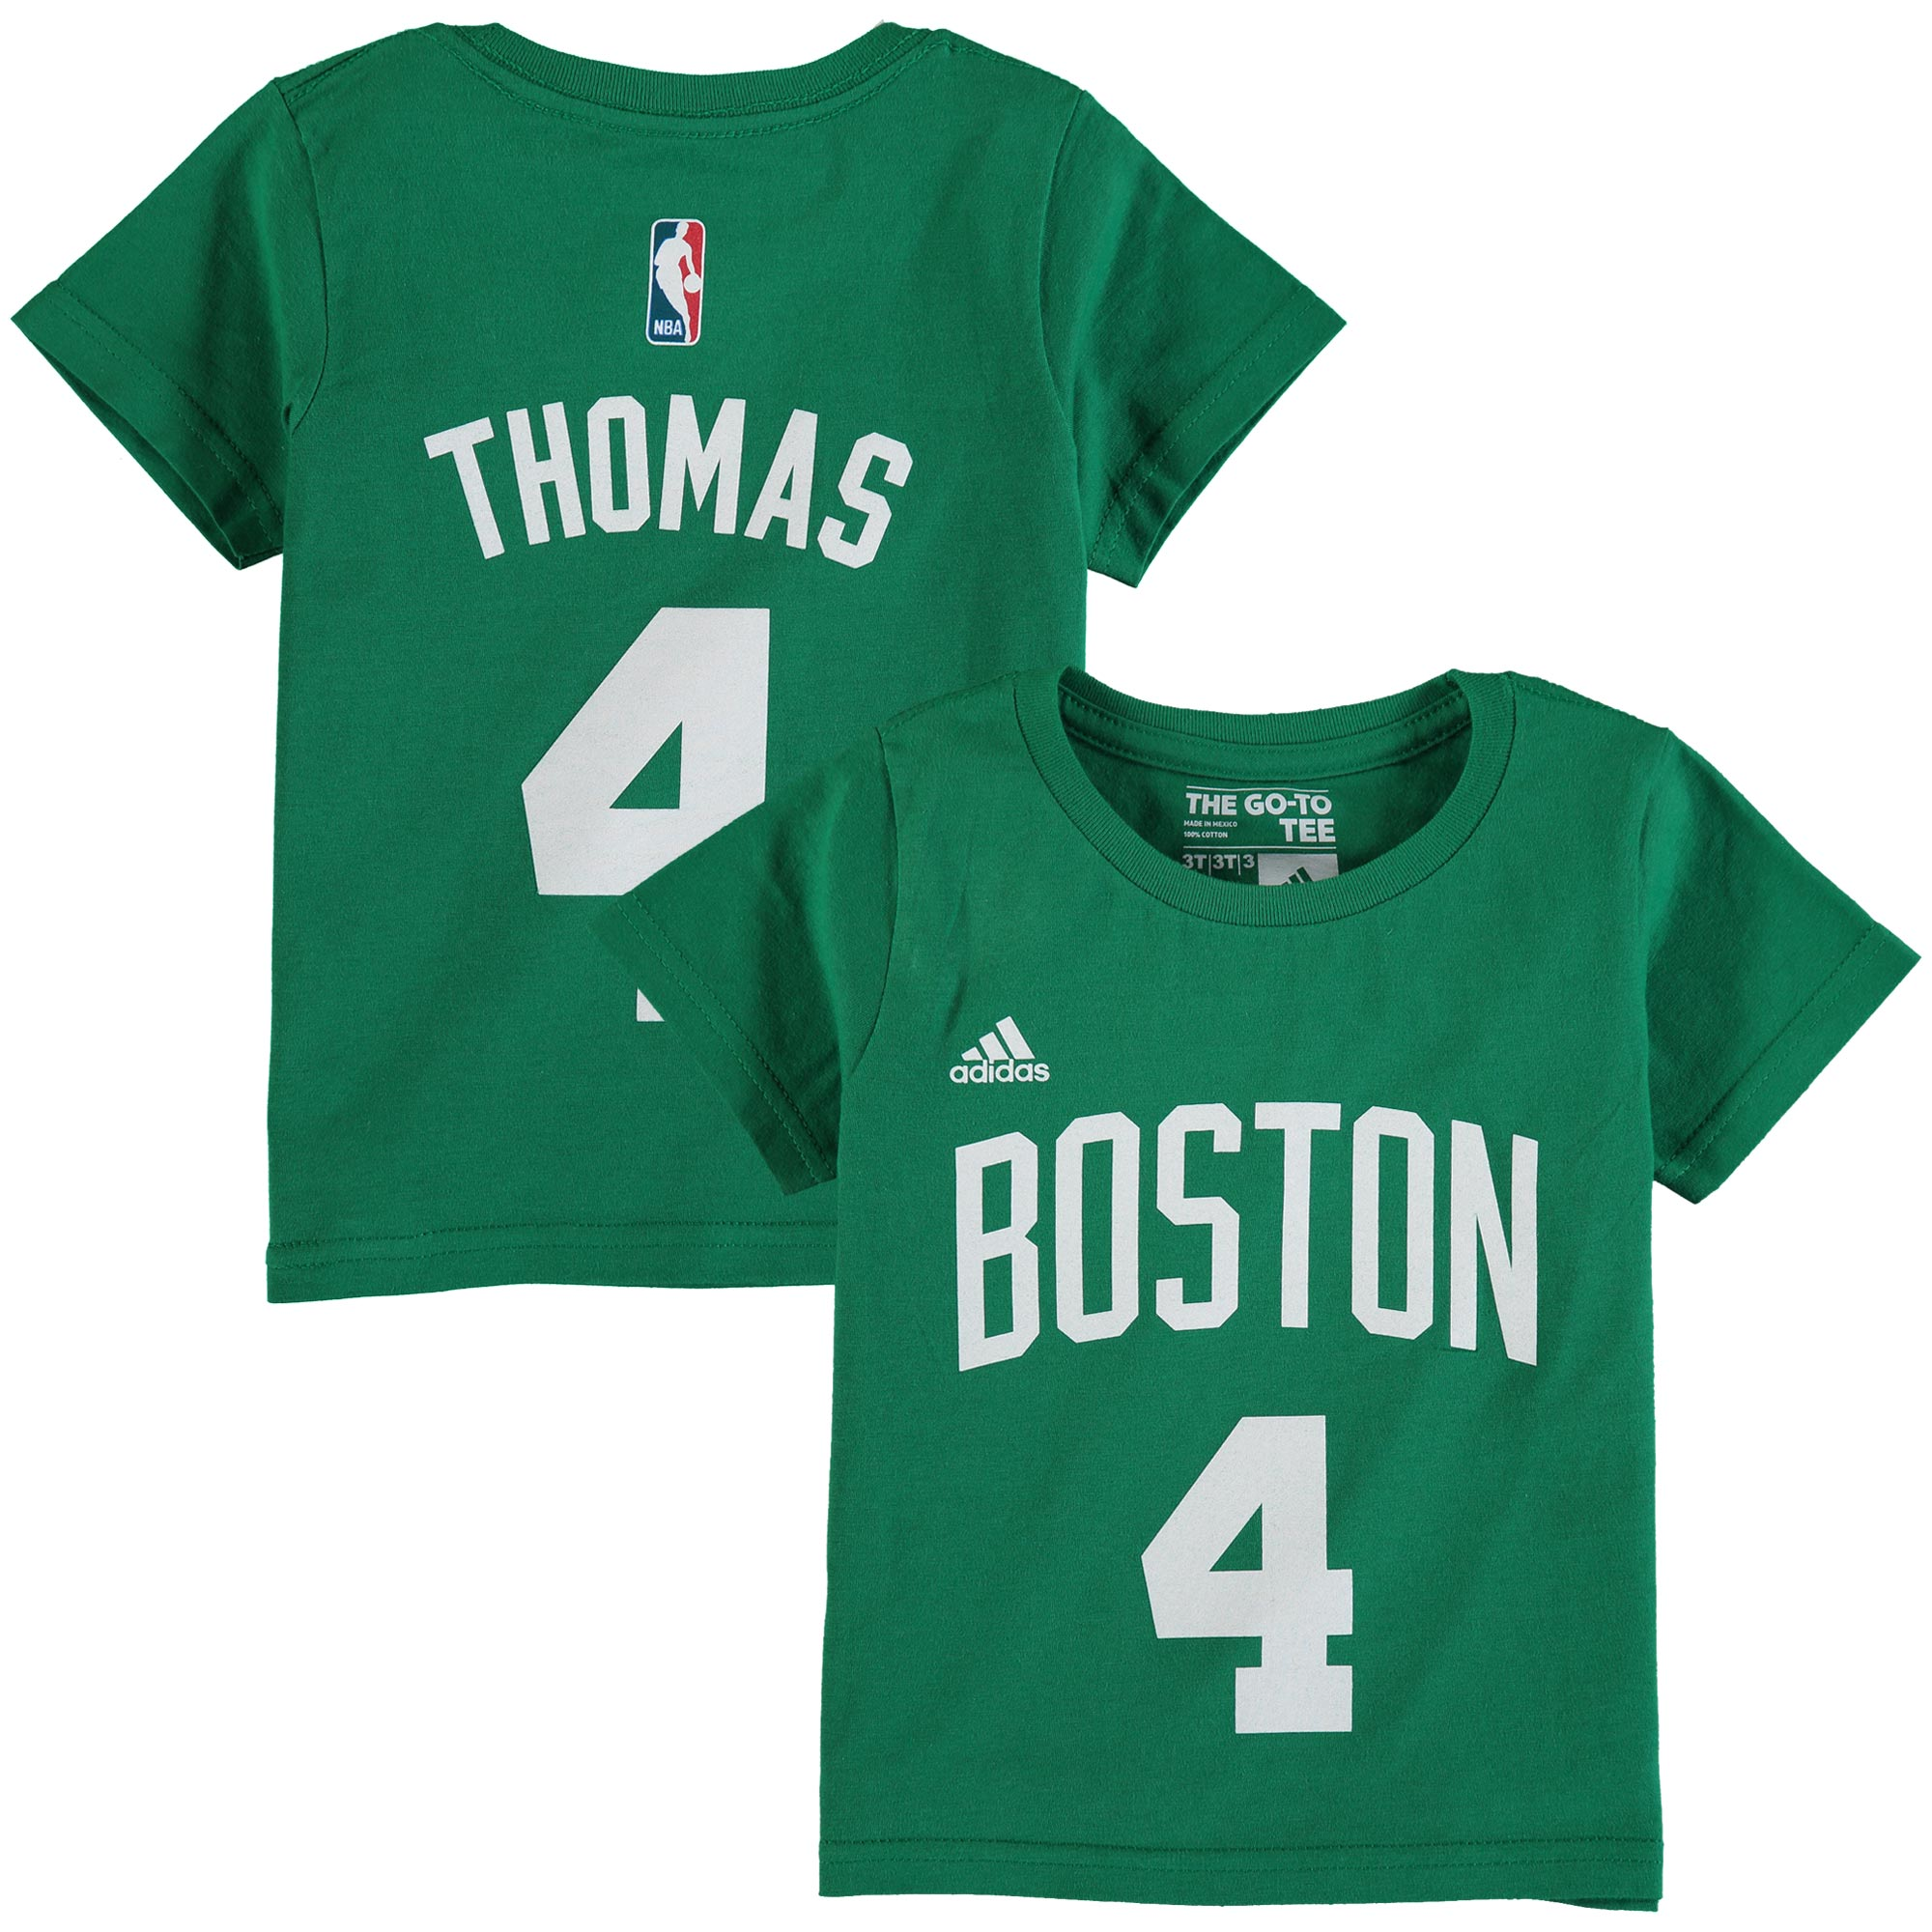 Isaiah Thomas Boston Celtics adidas Infant Name and Number T-Shirt - Green